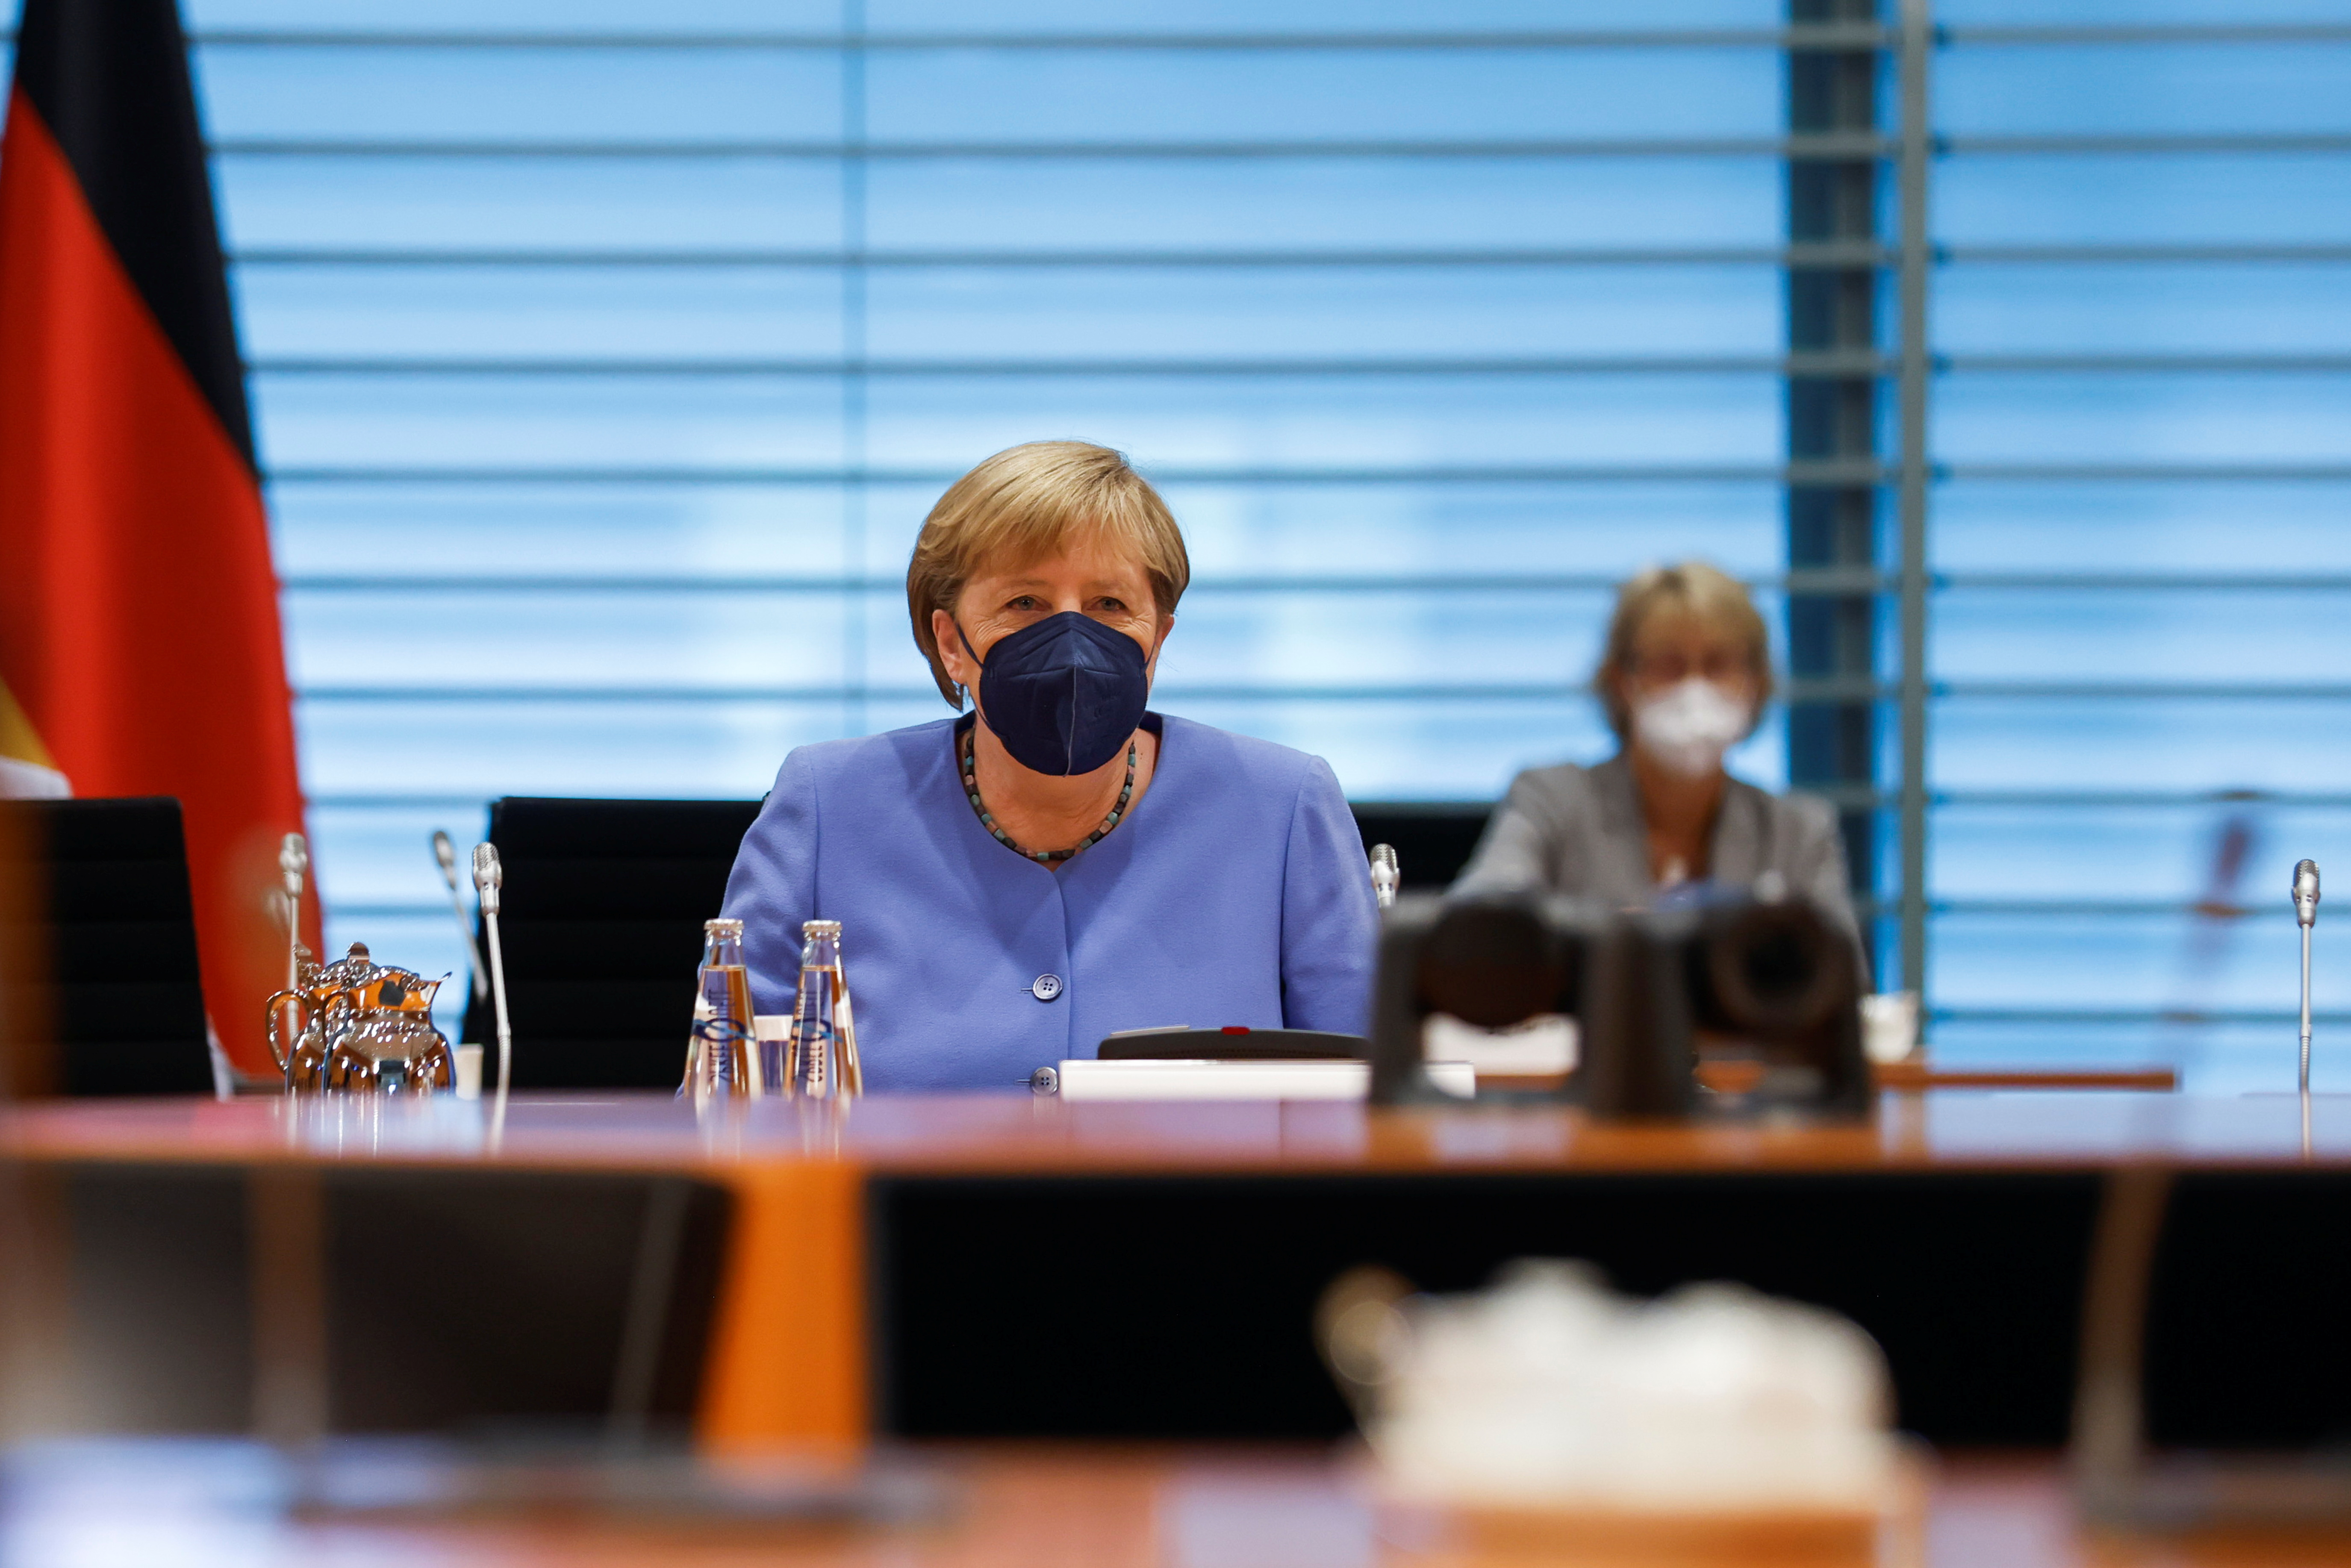 German Chancellor Angela Merkel looks on prior the weekly German cabinet meeting at the Chancellery in Berlin, Germany, July 21, 2021. REUTERS/Axel Schmidt/Pool